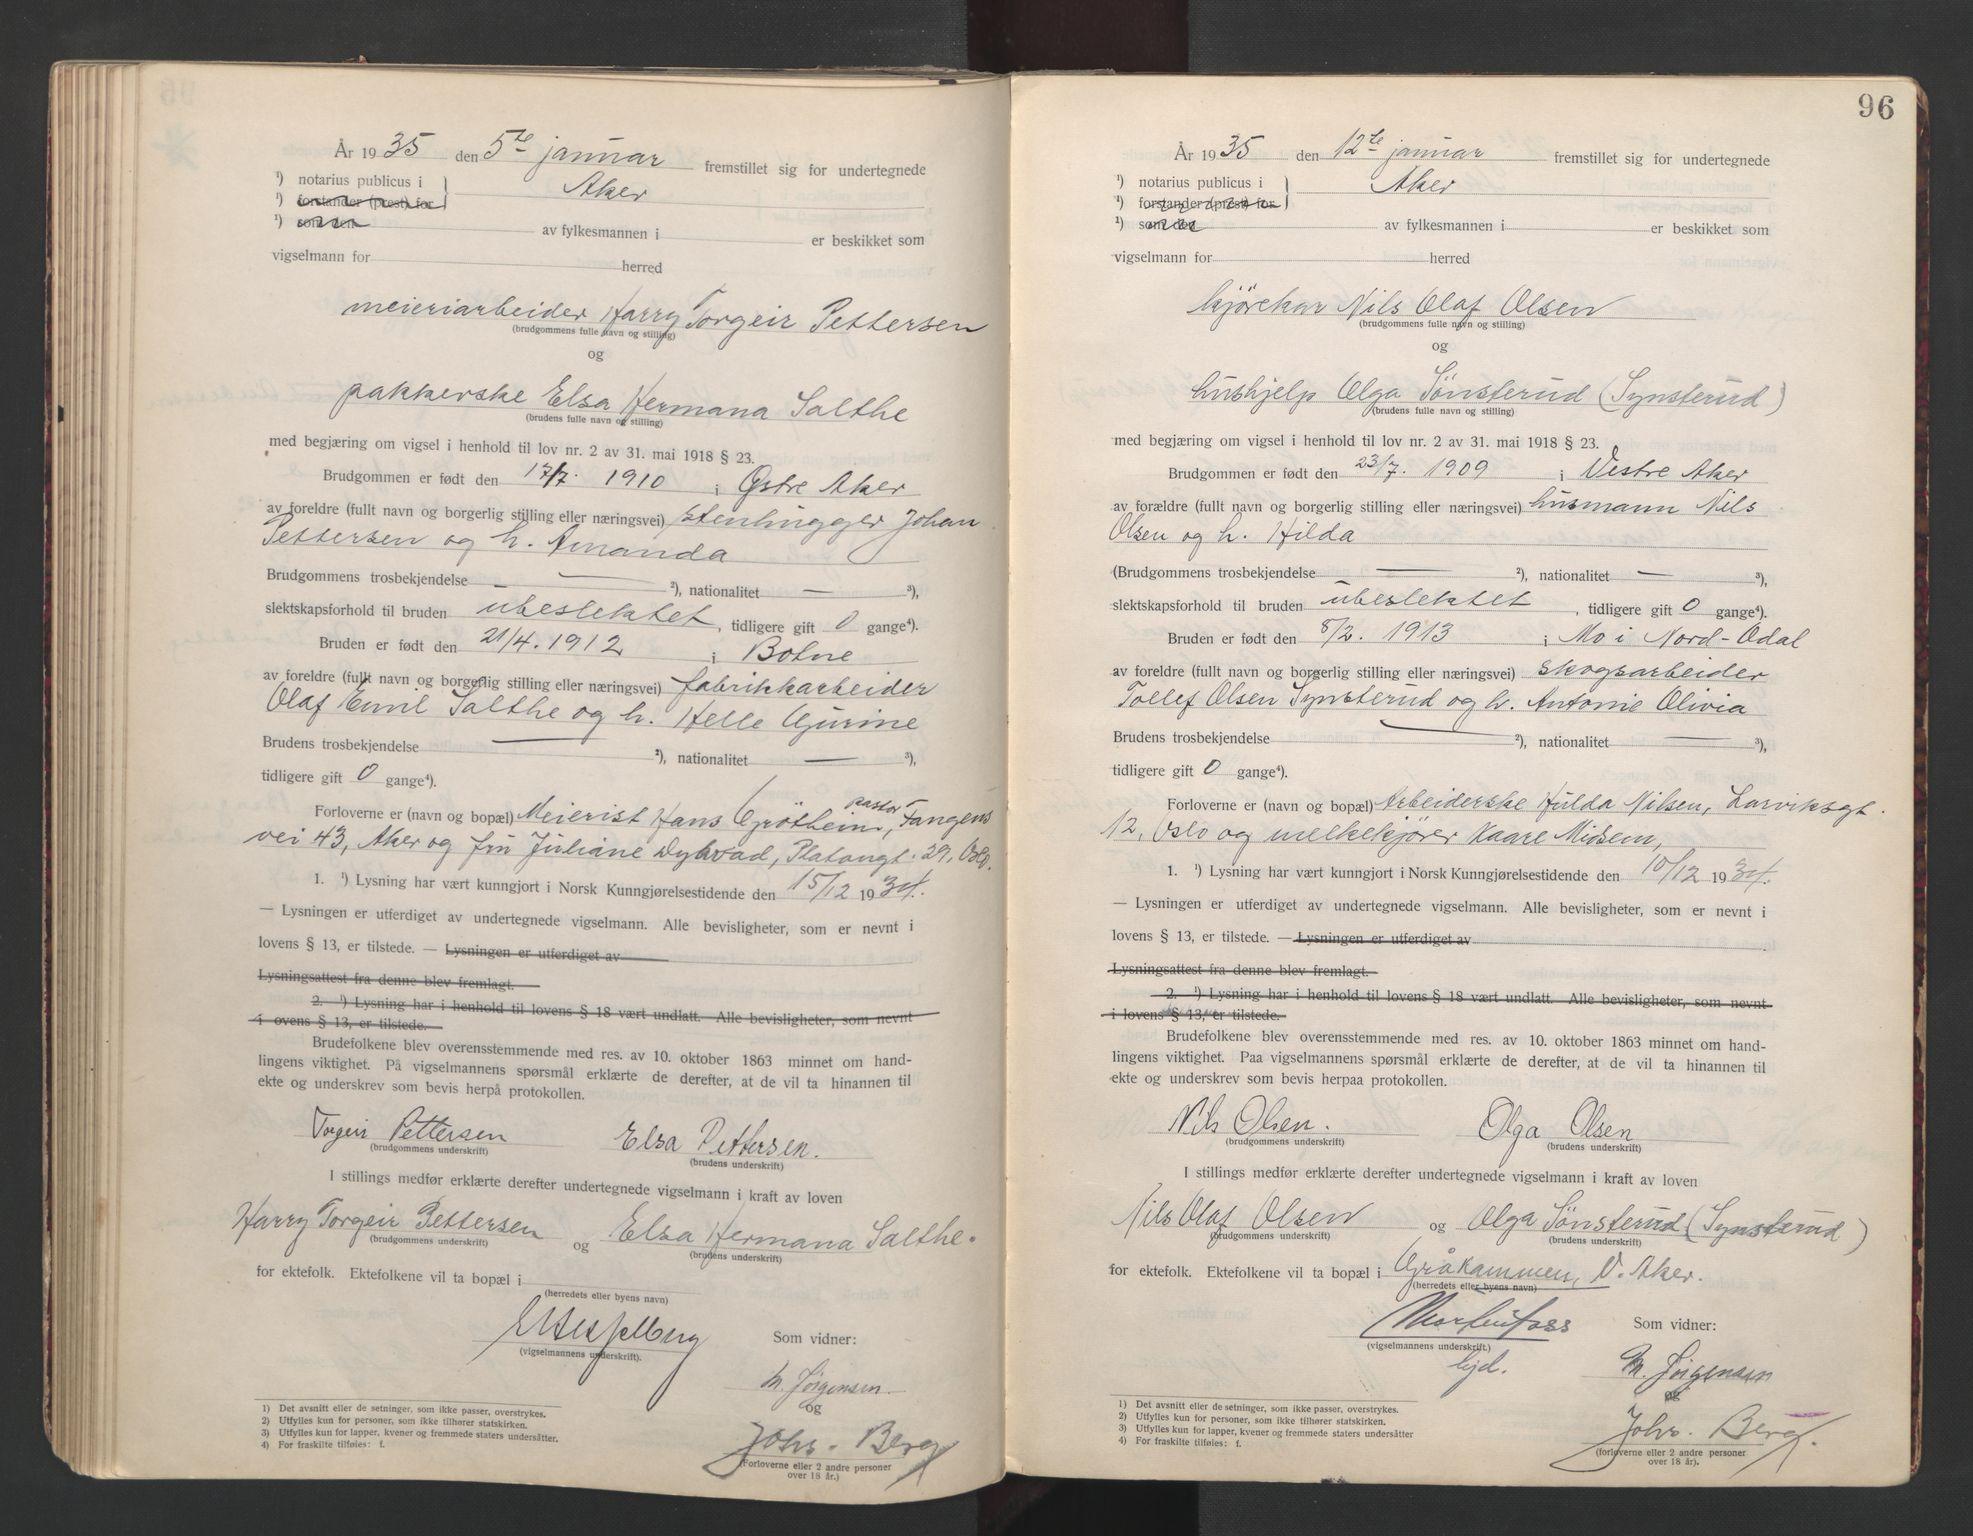 SAO, Aker sorenskriveri, L/Lc/Lcb/L0007: Vigselprotokoll, 1933-1935, s. 96